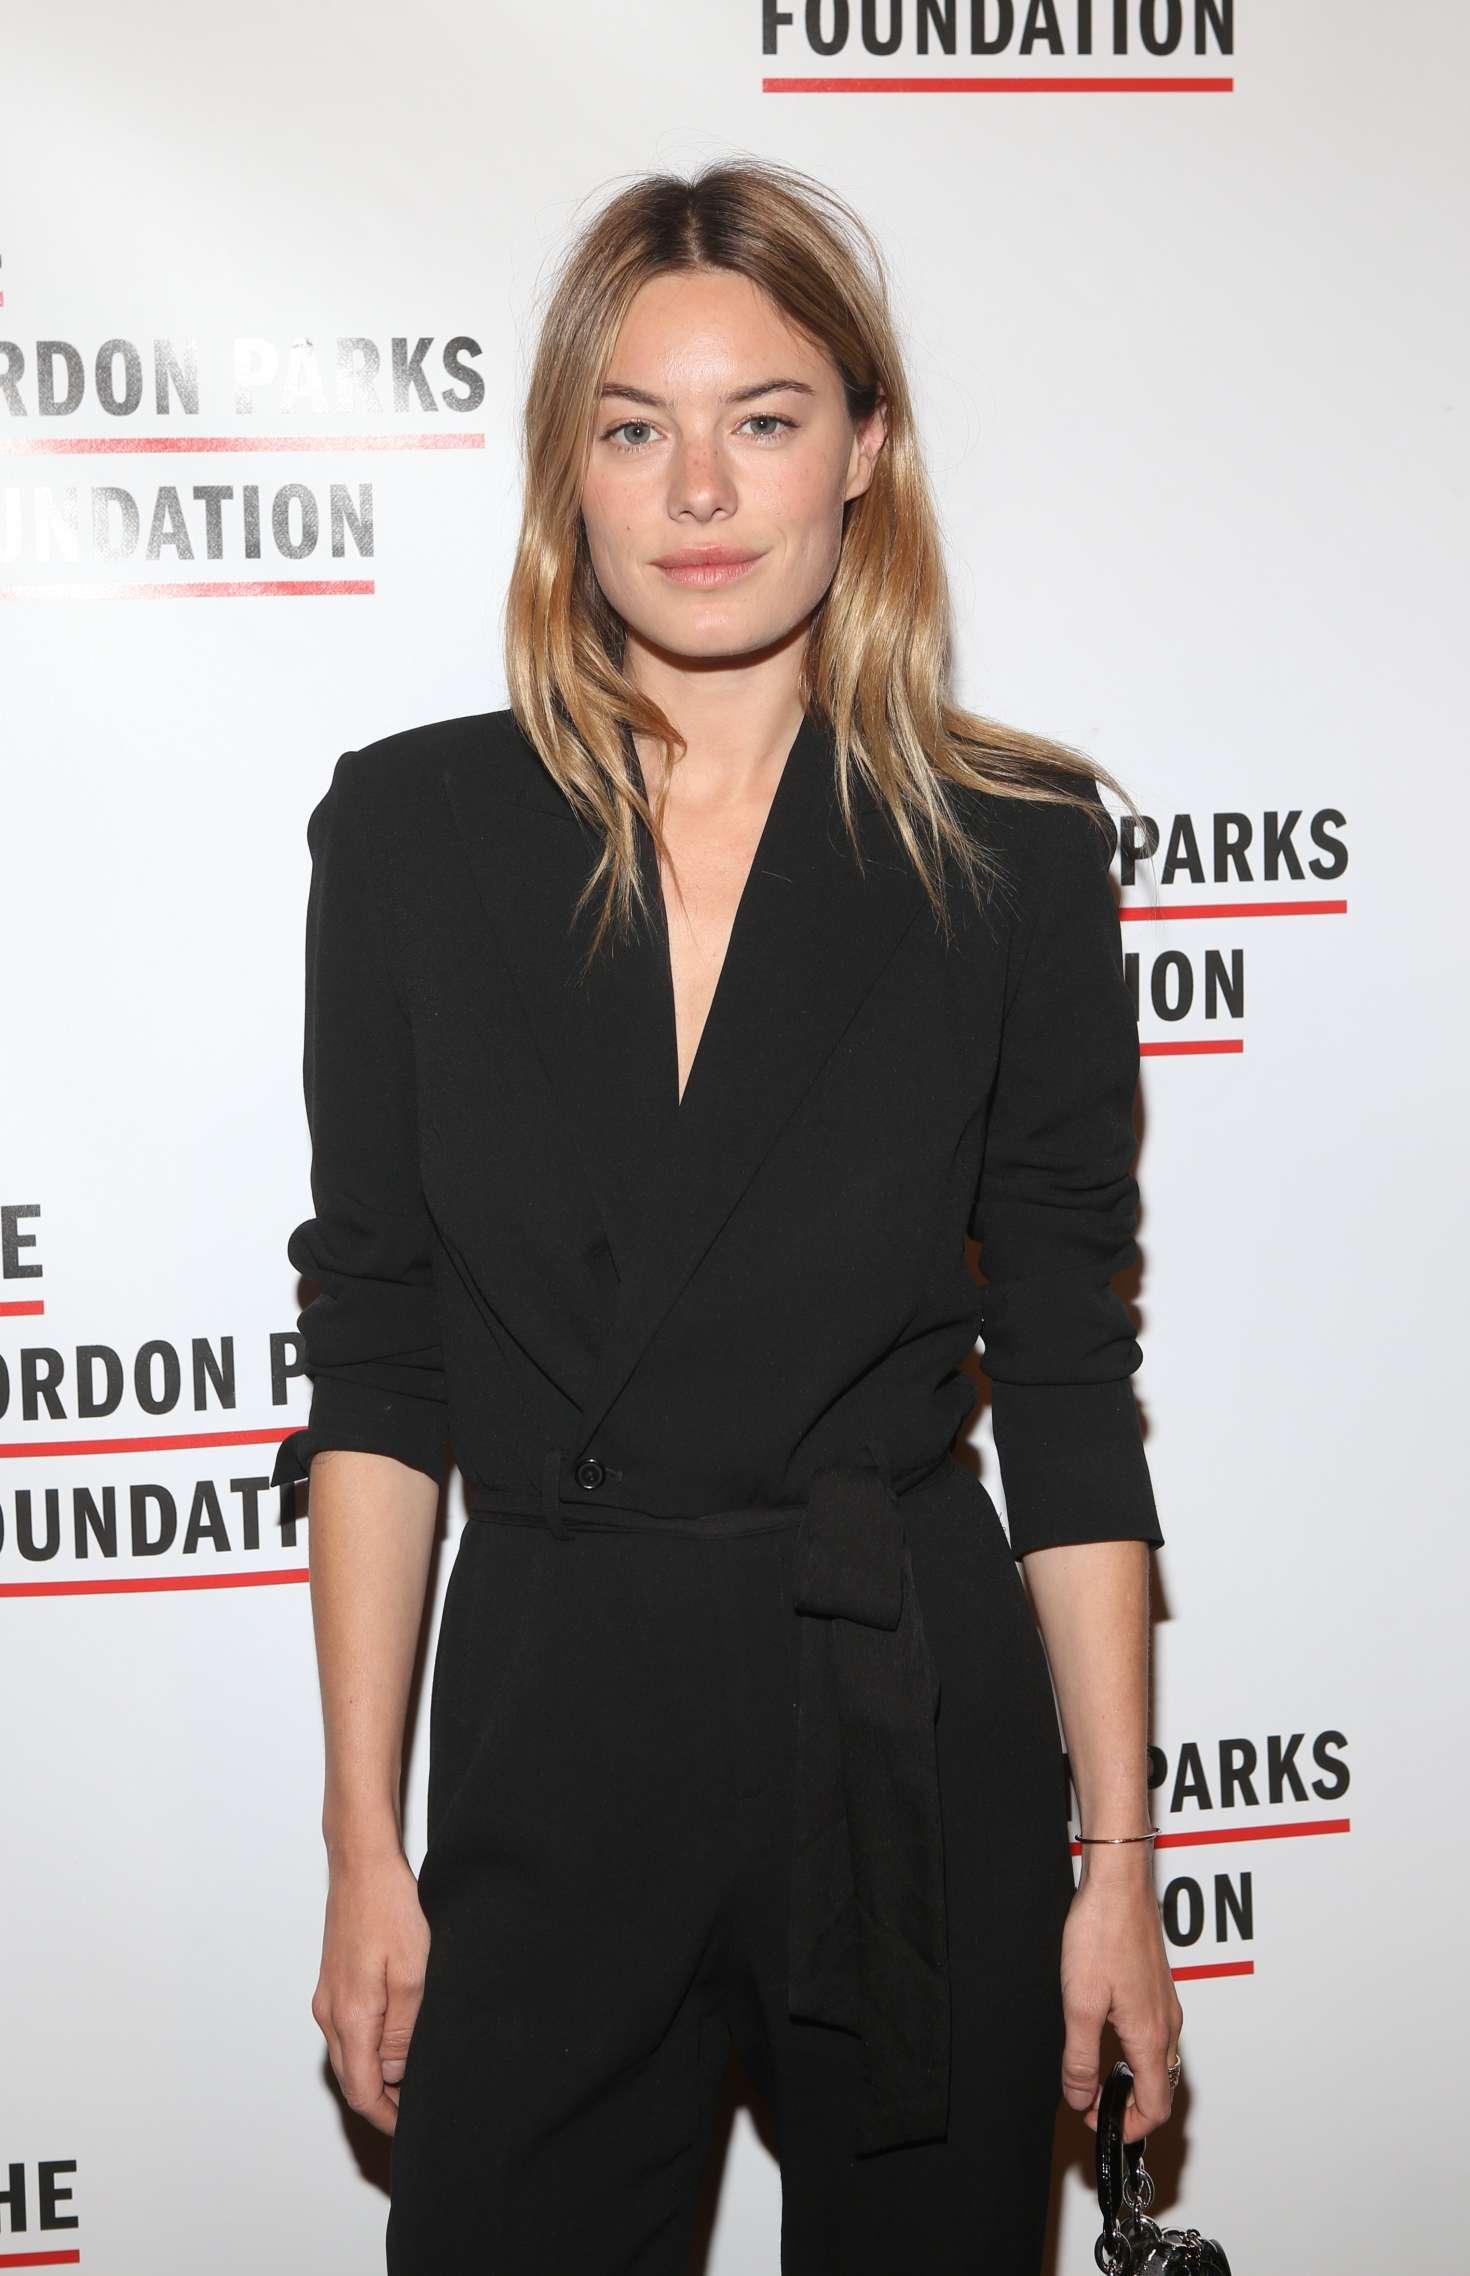 Camille Rowe - Gordon Parks Foundation Awards Dinner in New York